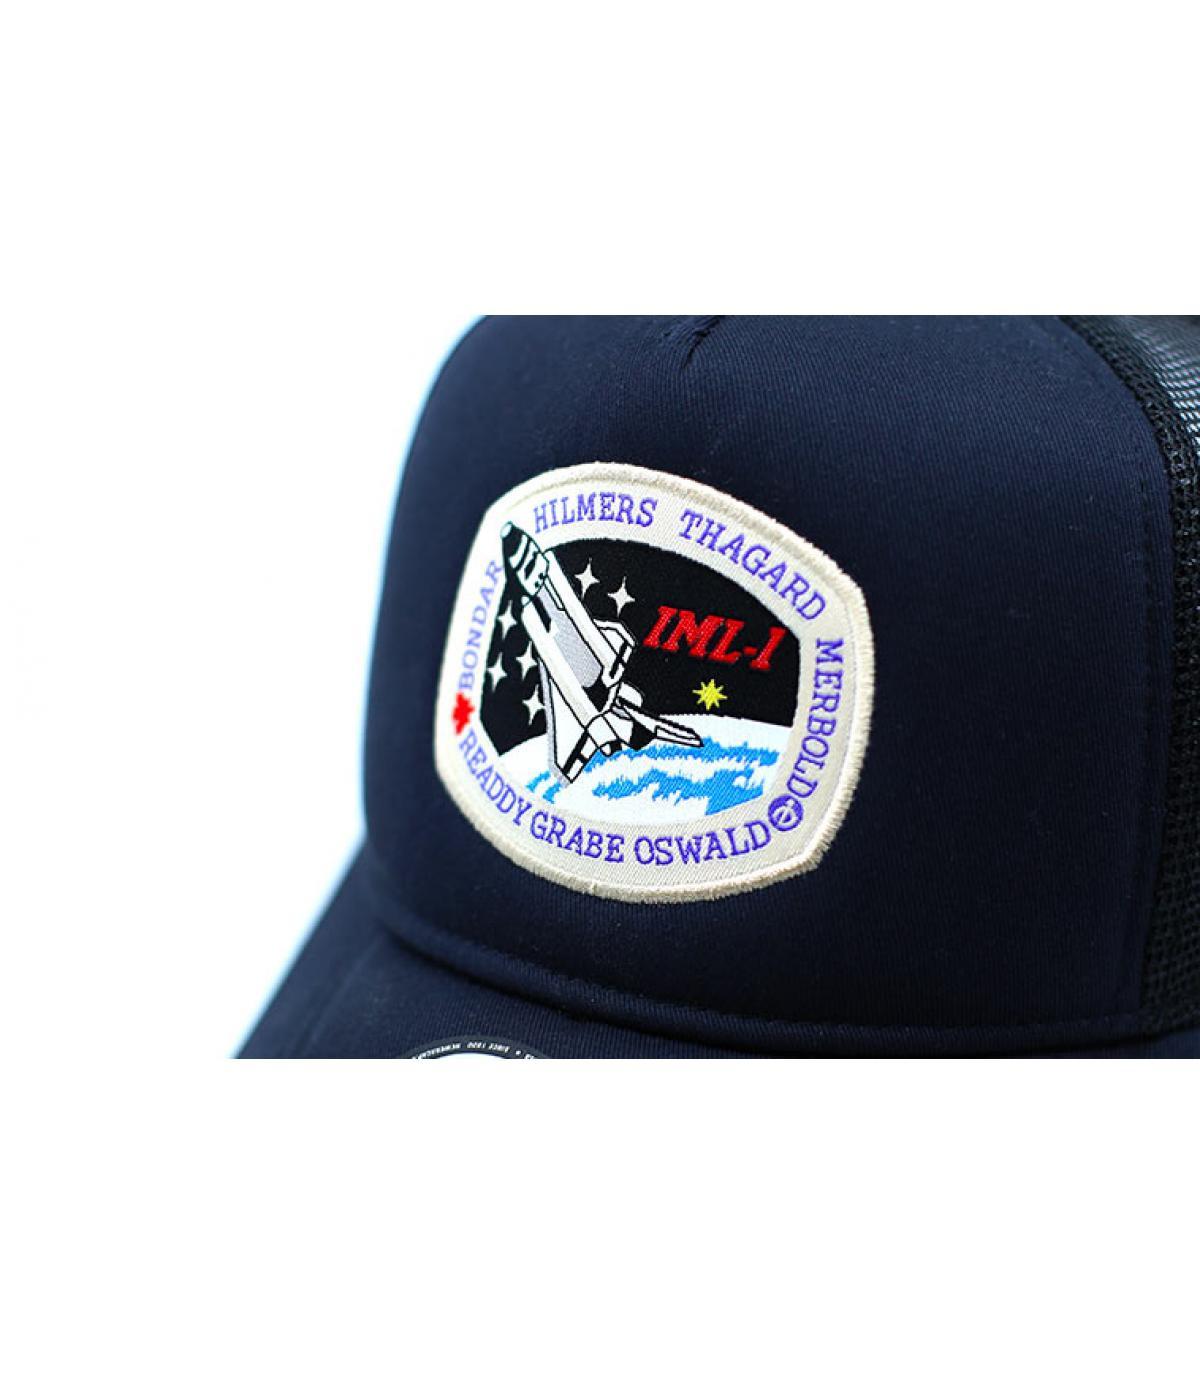 Details Trucker ISA navy - Abbildung 3